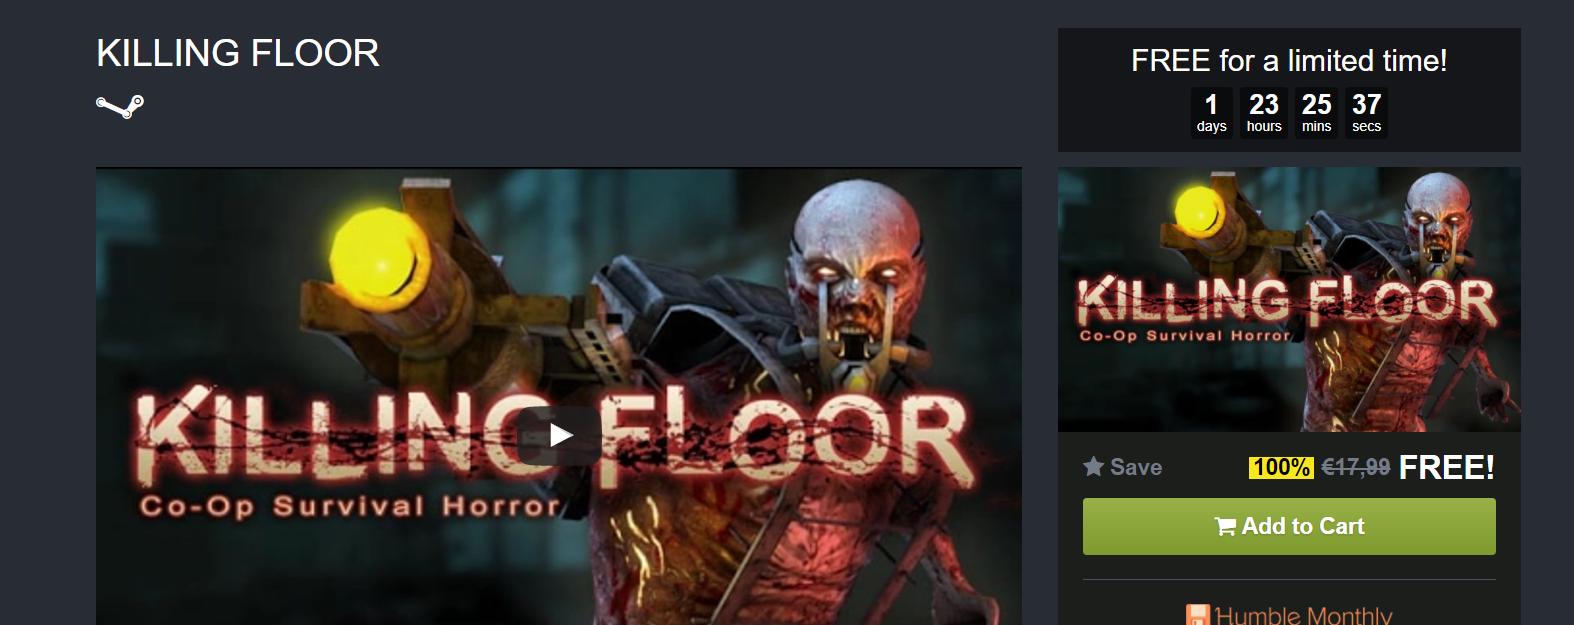 Killing Floor gratis para Steam (PC)